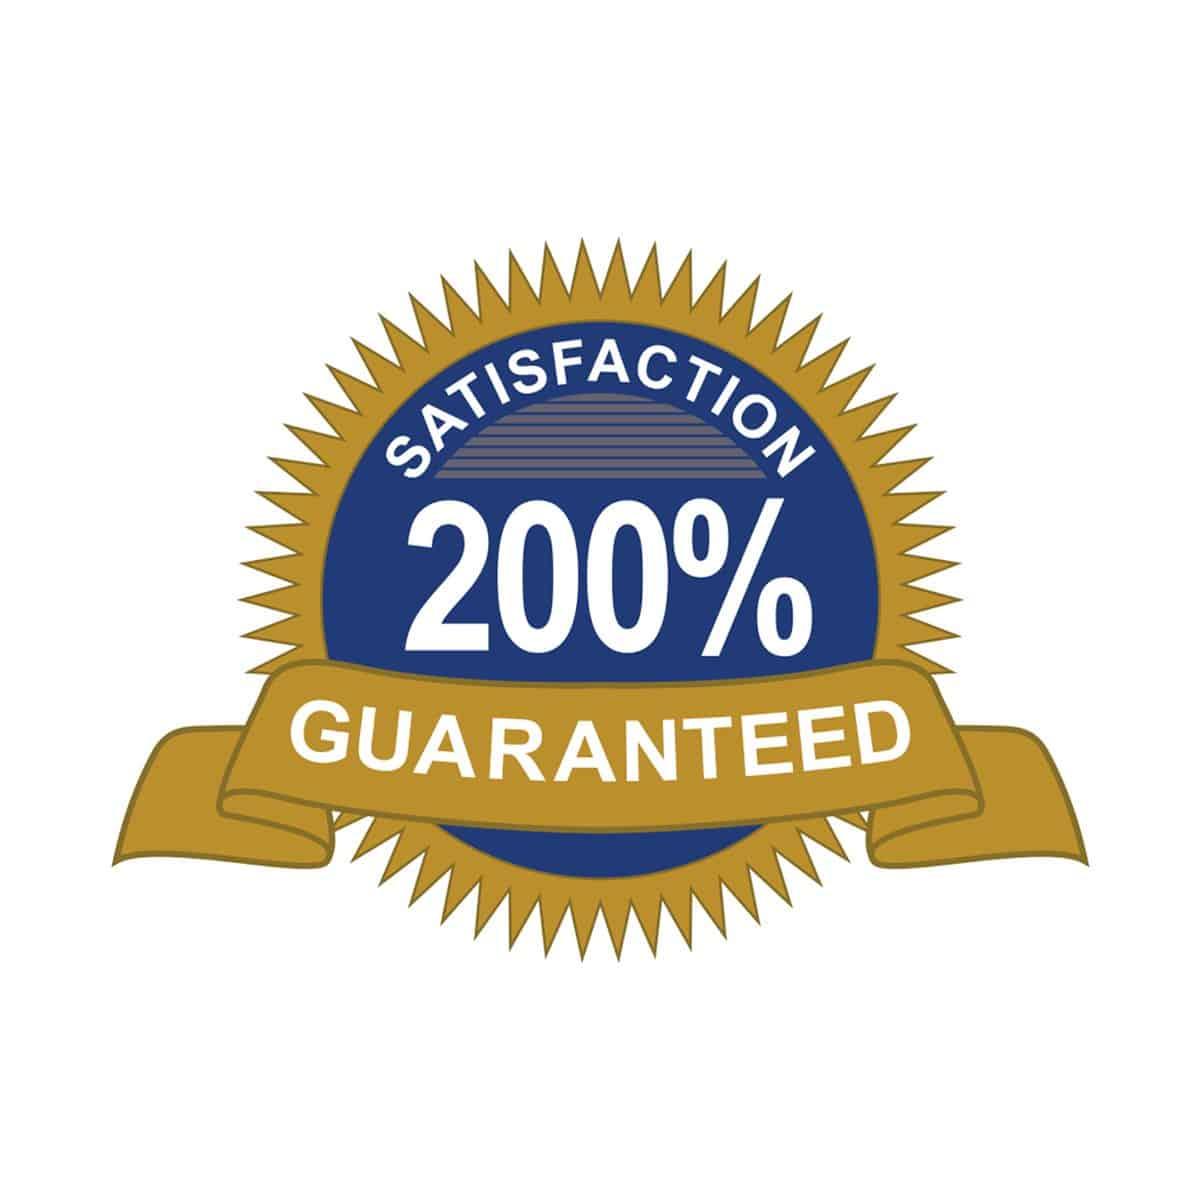 200 percent Satisfaction Guarantee Logo